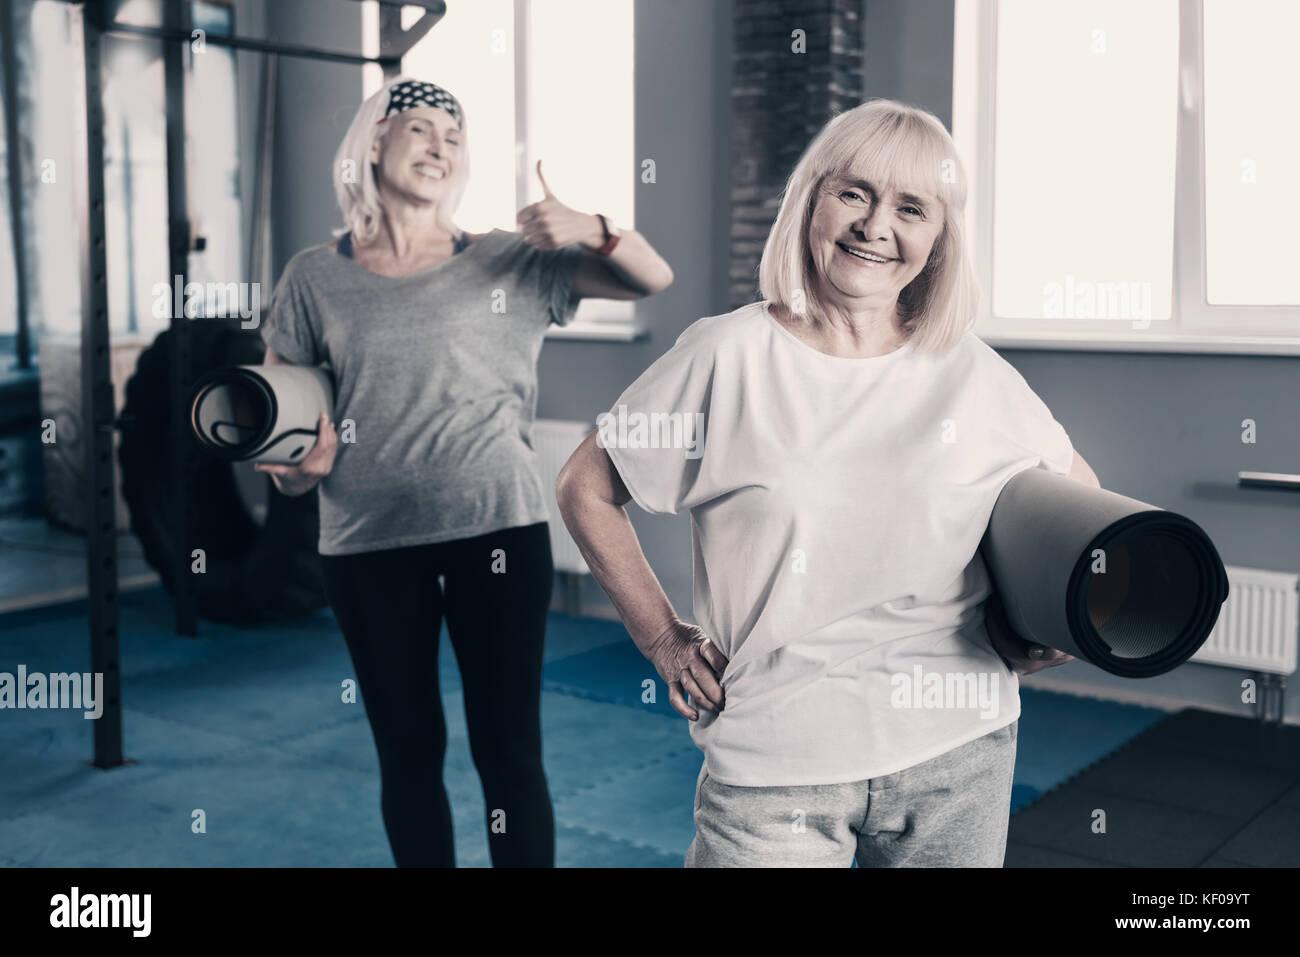 Cheerful elderly women posing with yoga mats - Stock Image